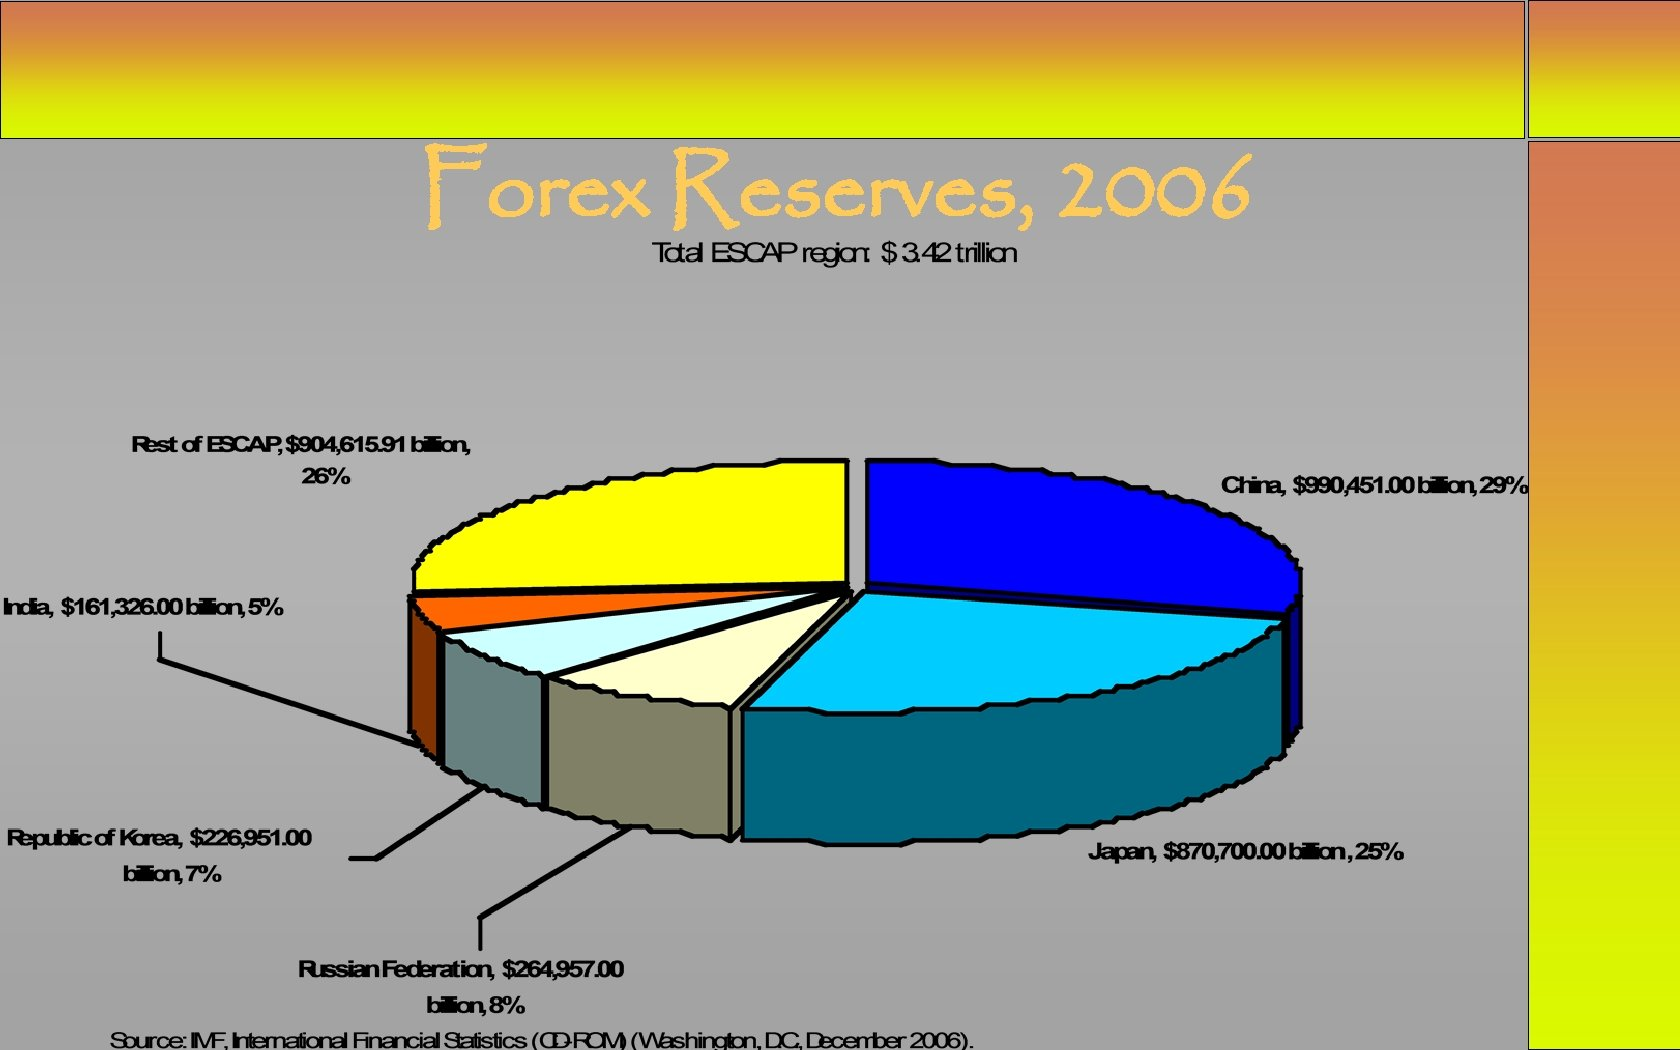 Forex Reserves, 2006